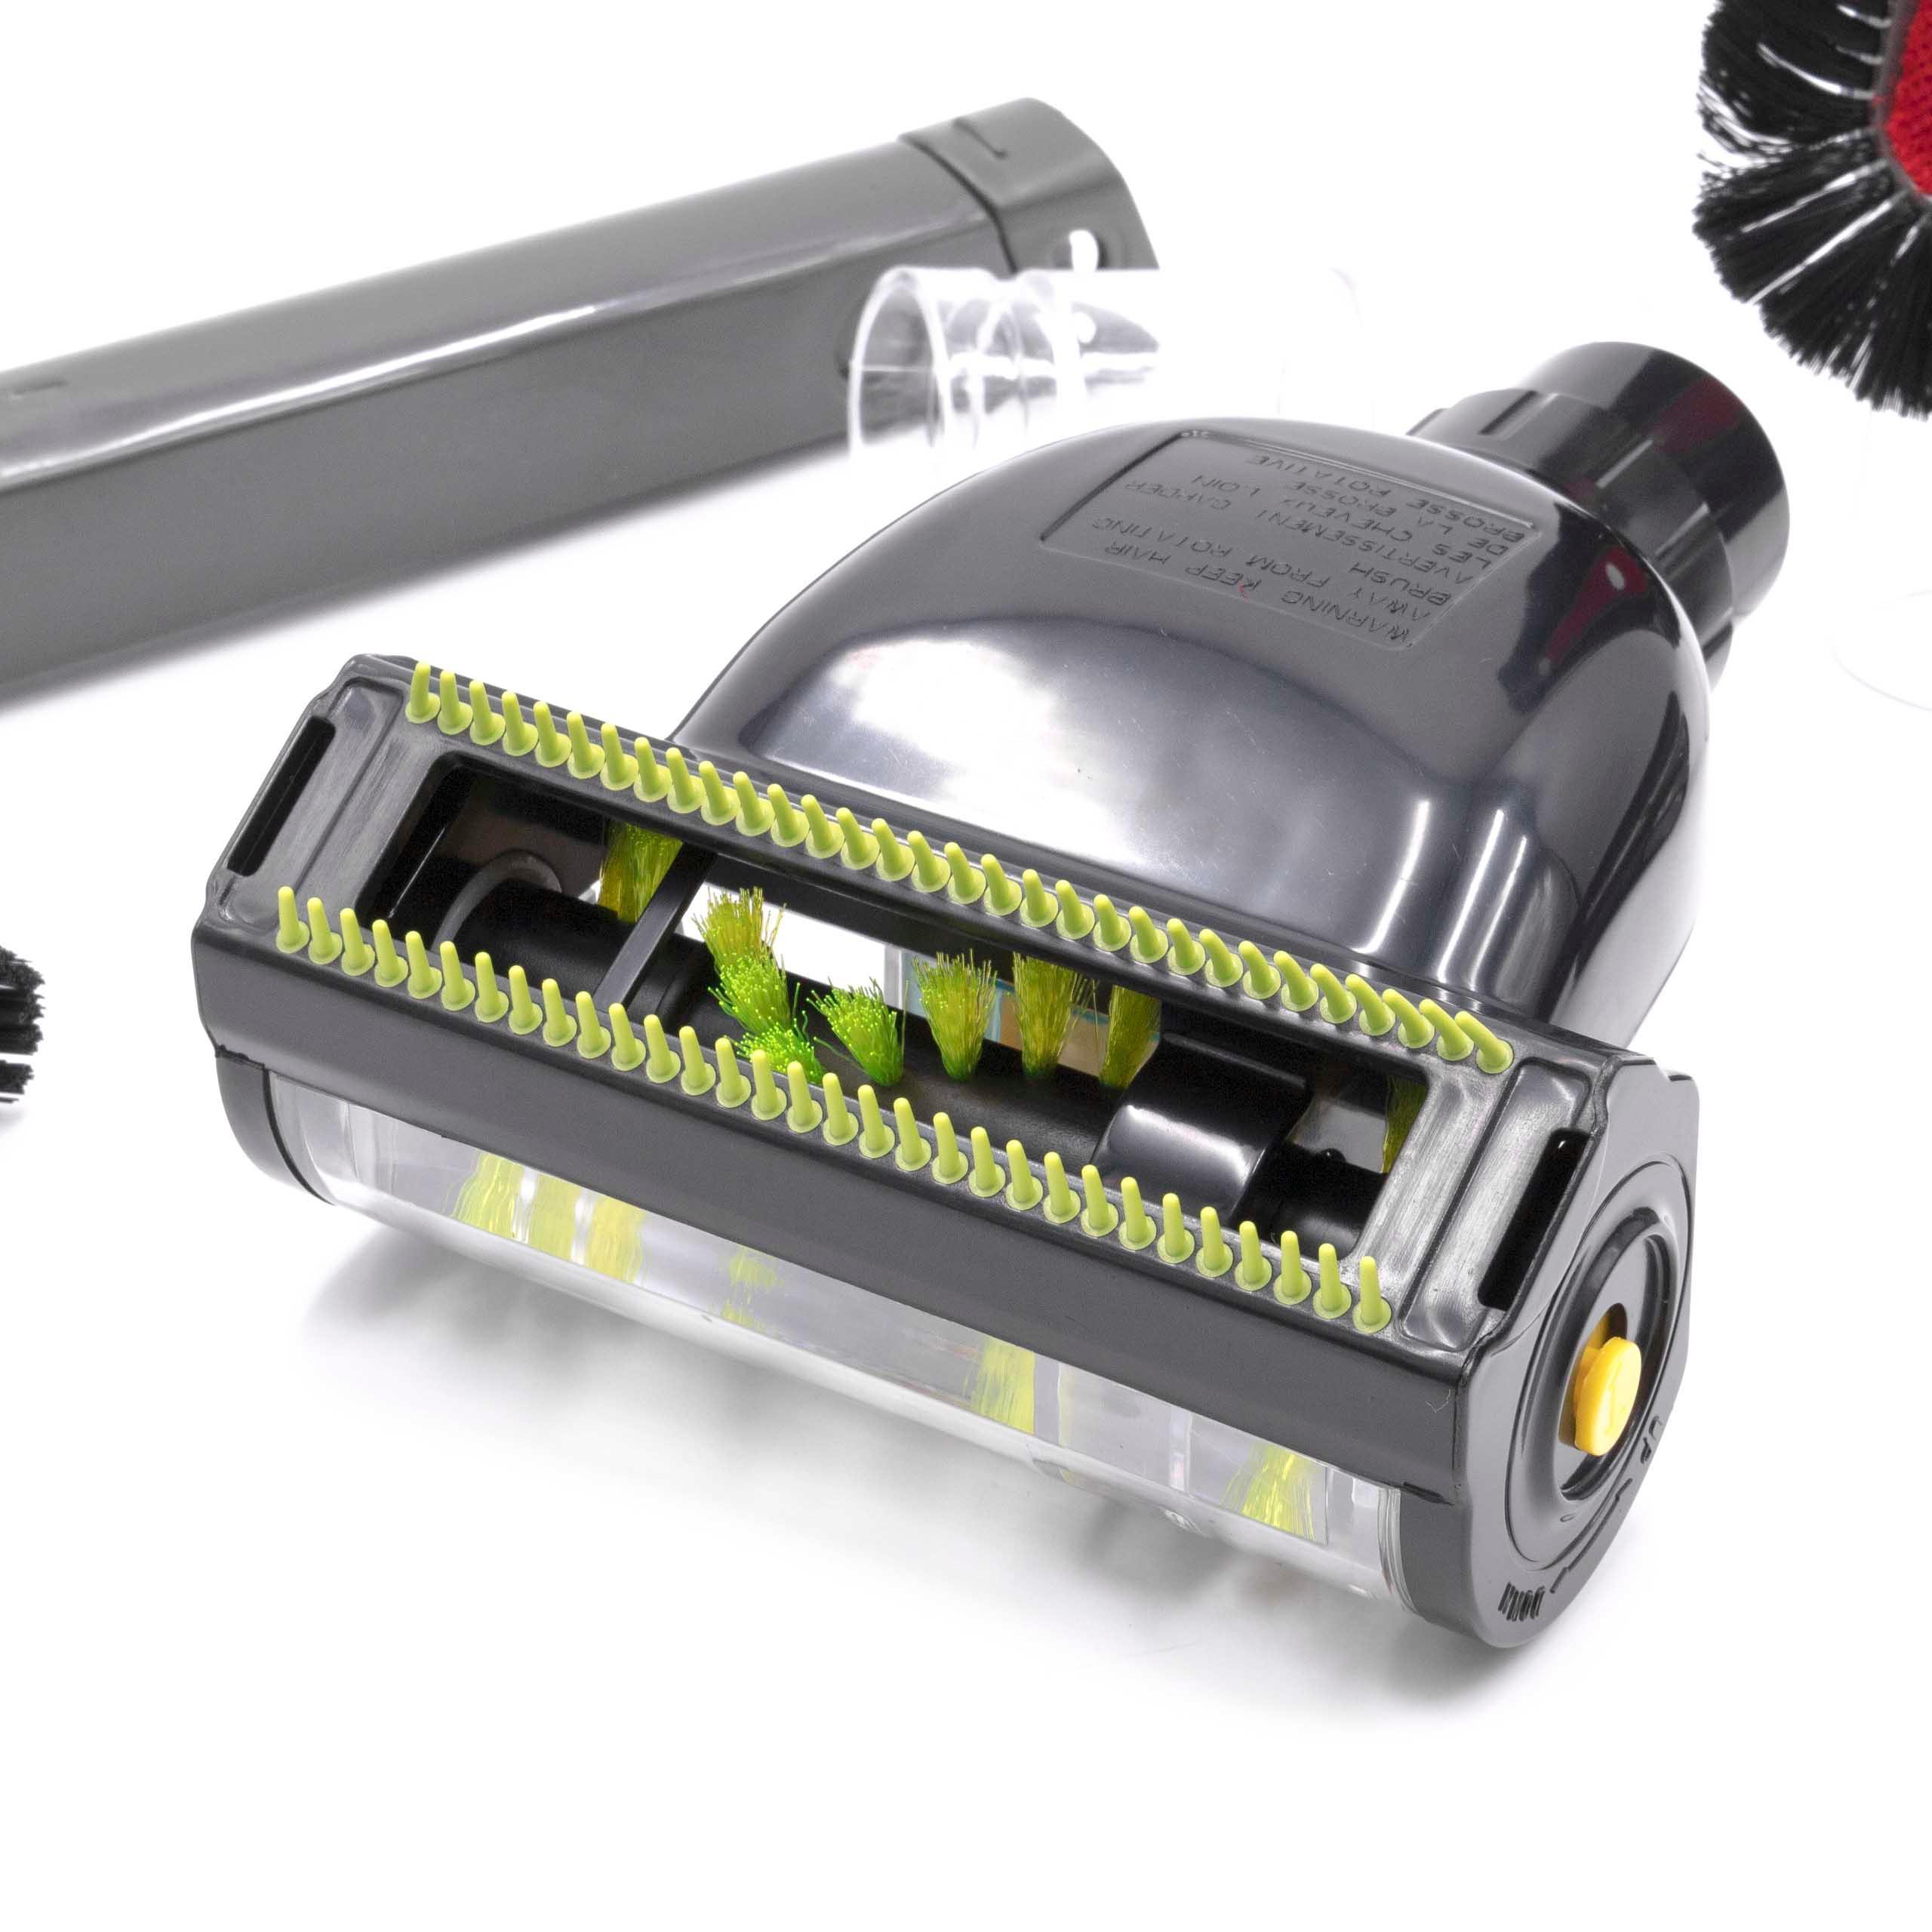 staubsauger zubeh r set 32mm f r dyson dc30 dc31 dc32 dc33 dc34 dc39 ebay. Black Bedroom Furniture Sets. Home Design Ideas